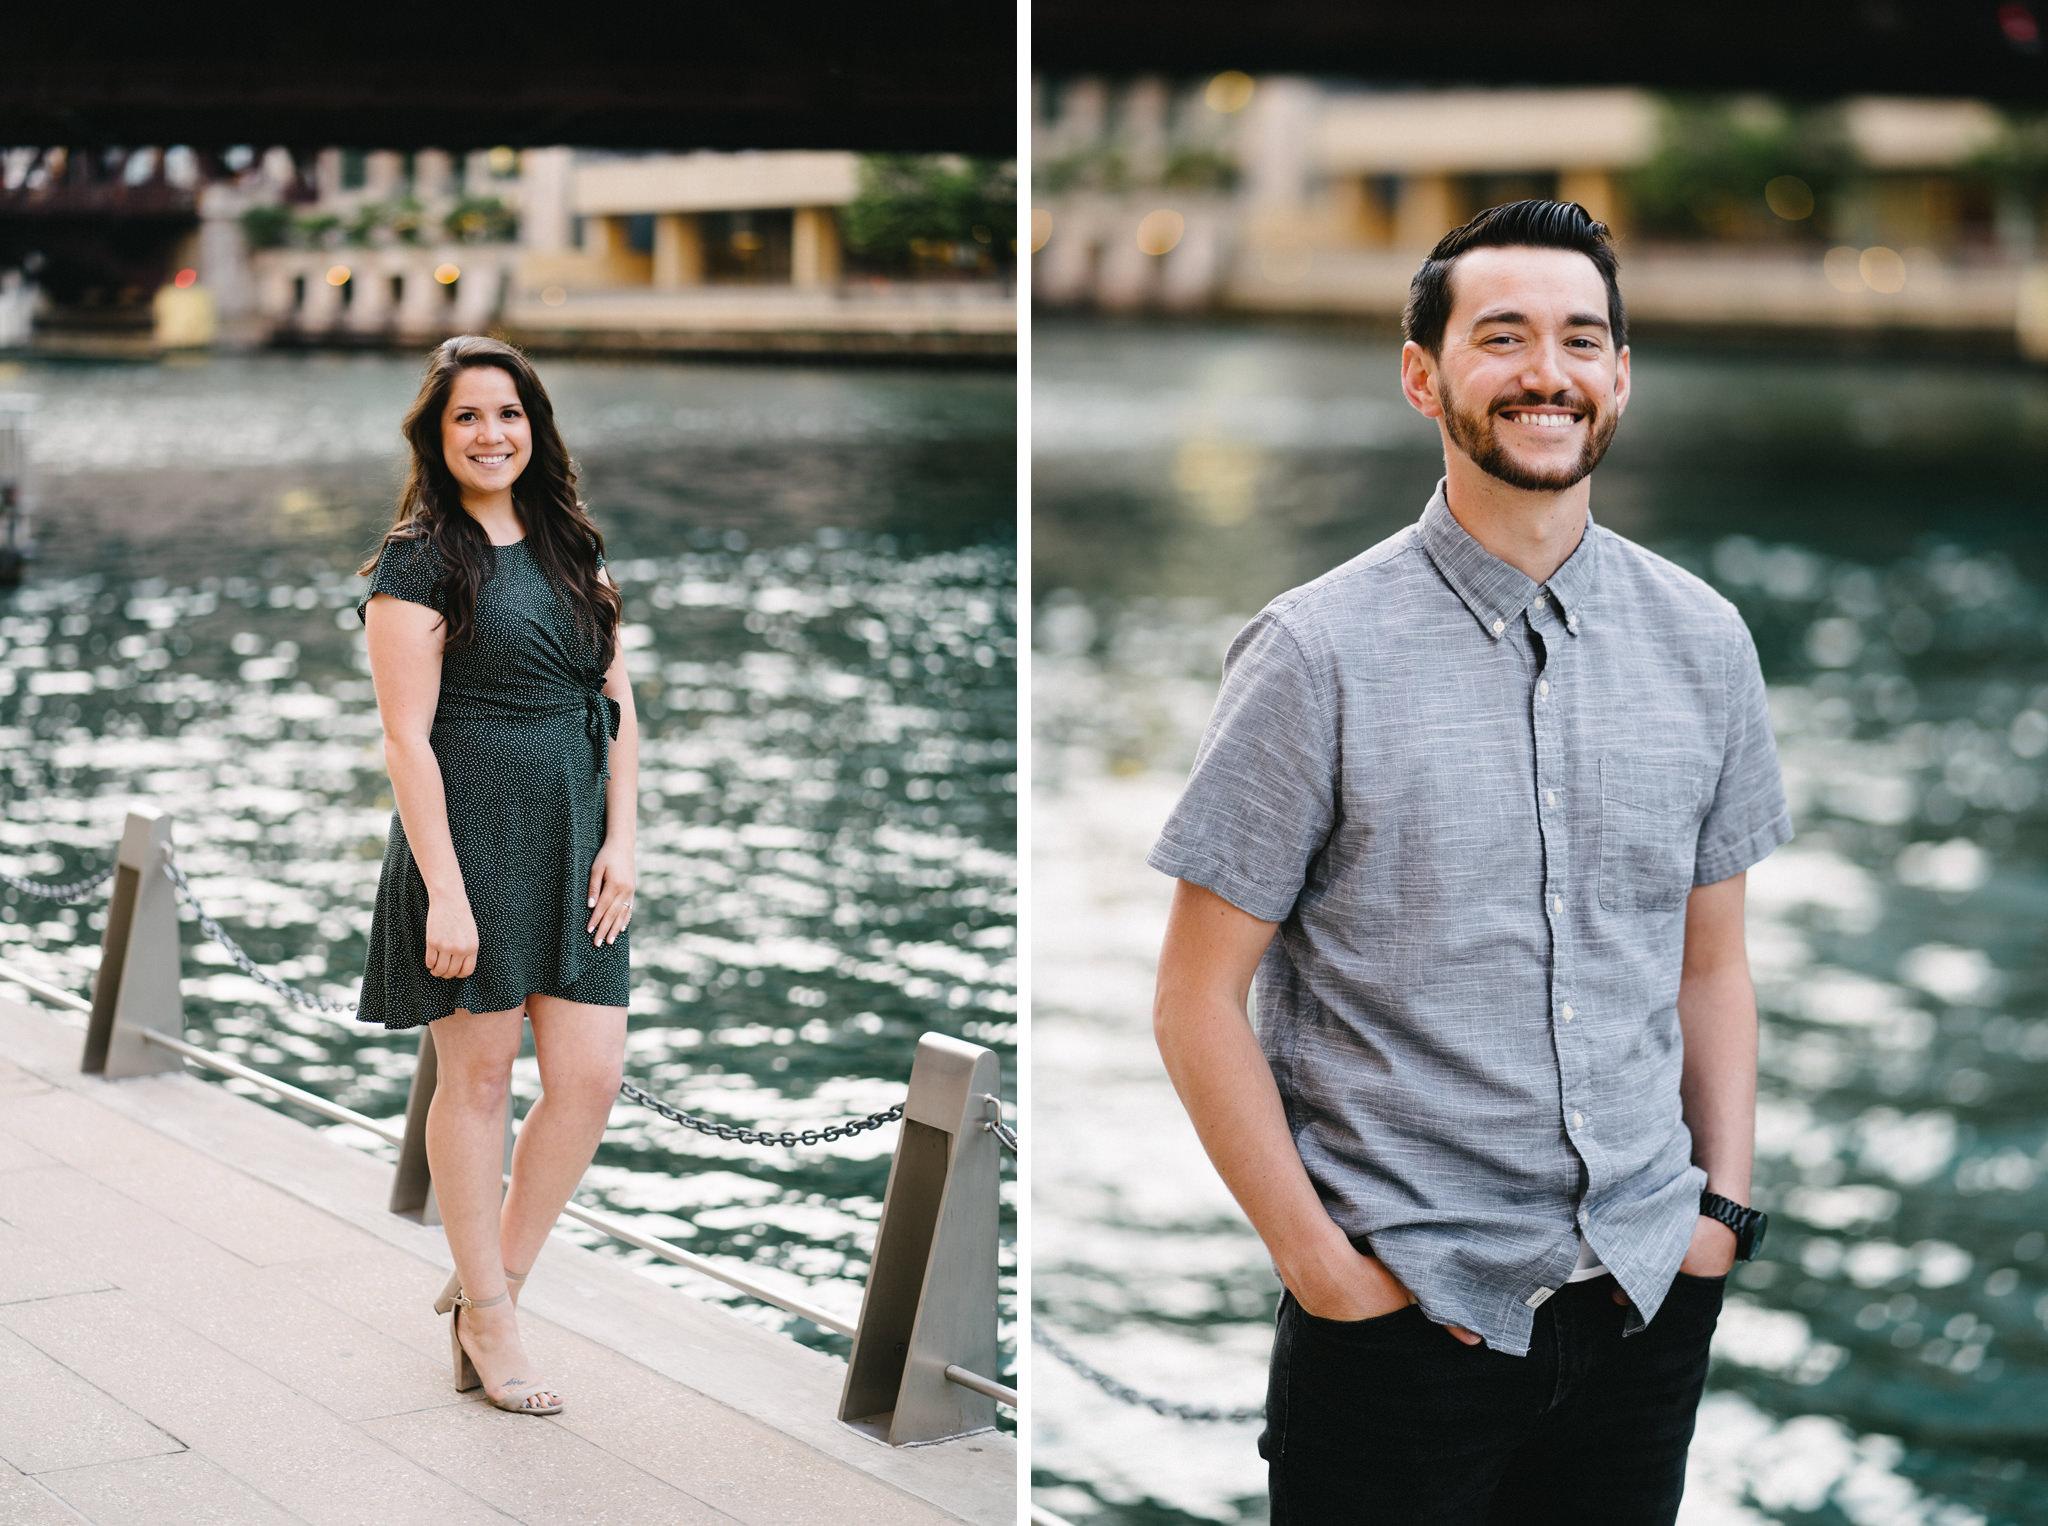 013-rempel-photography-chicago-wedding-inspiration-matt-mariana-riverwalk-engagement-session-city-view-loft-ohana-events.jpg